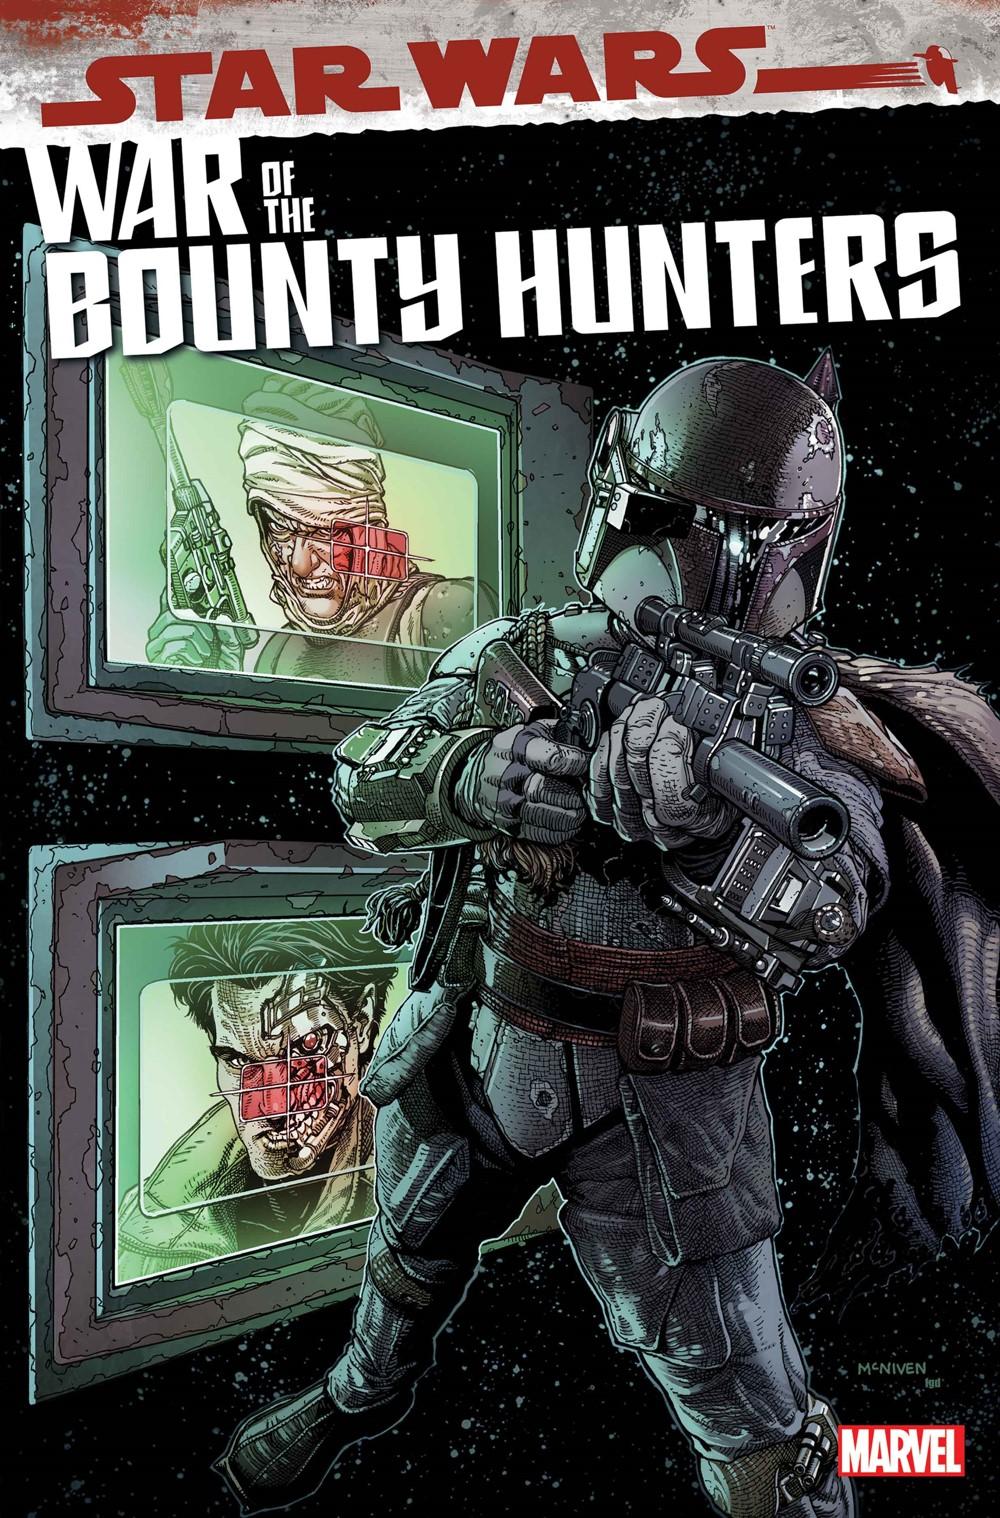 STWWAROTBH2021004_COV Marvel Comics September 2021 Solicitations